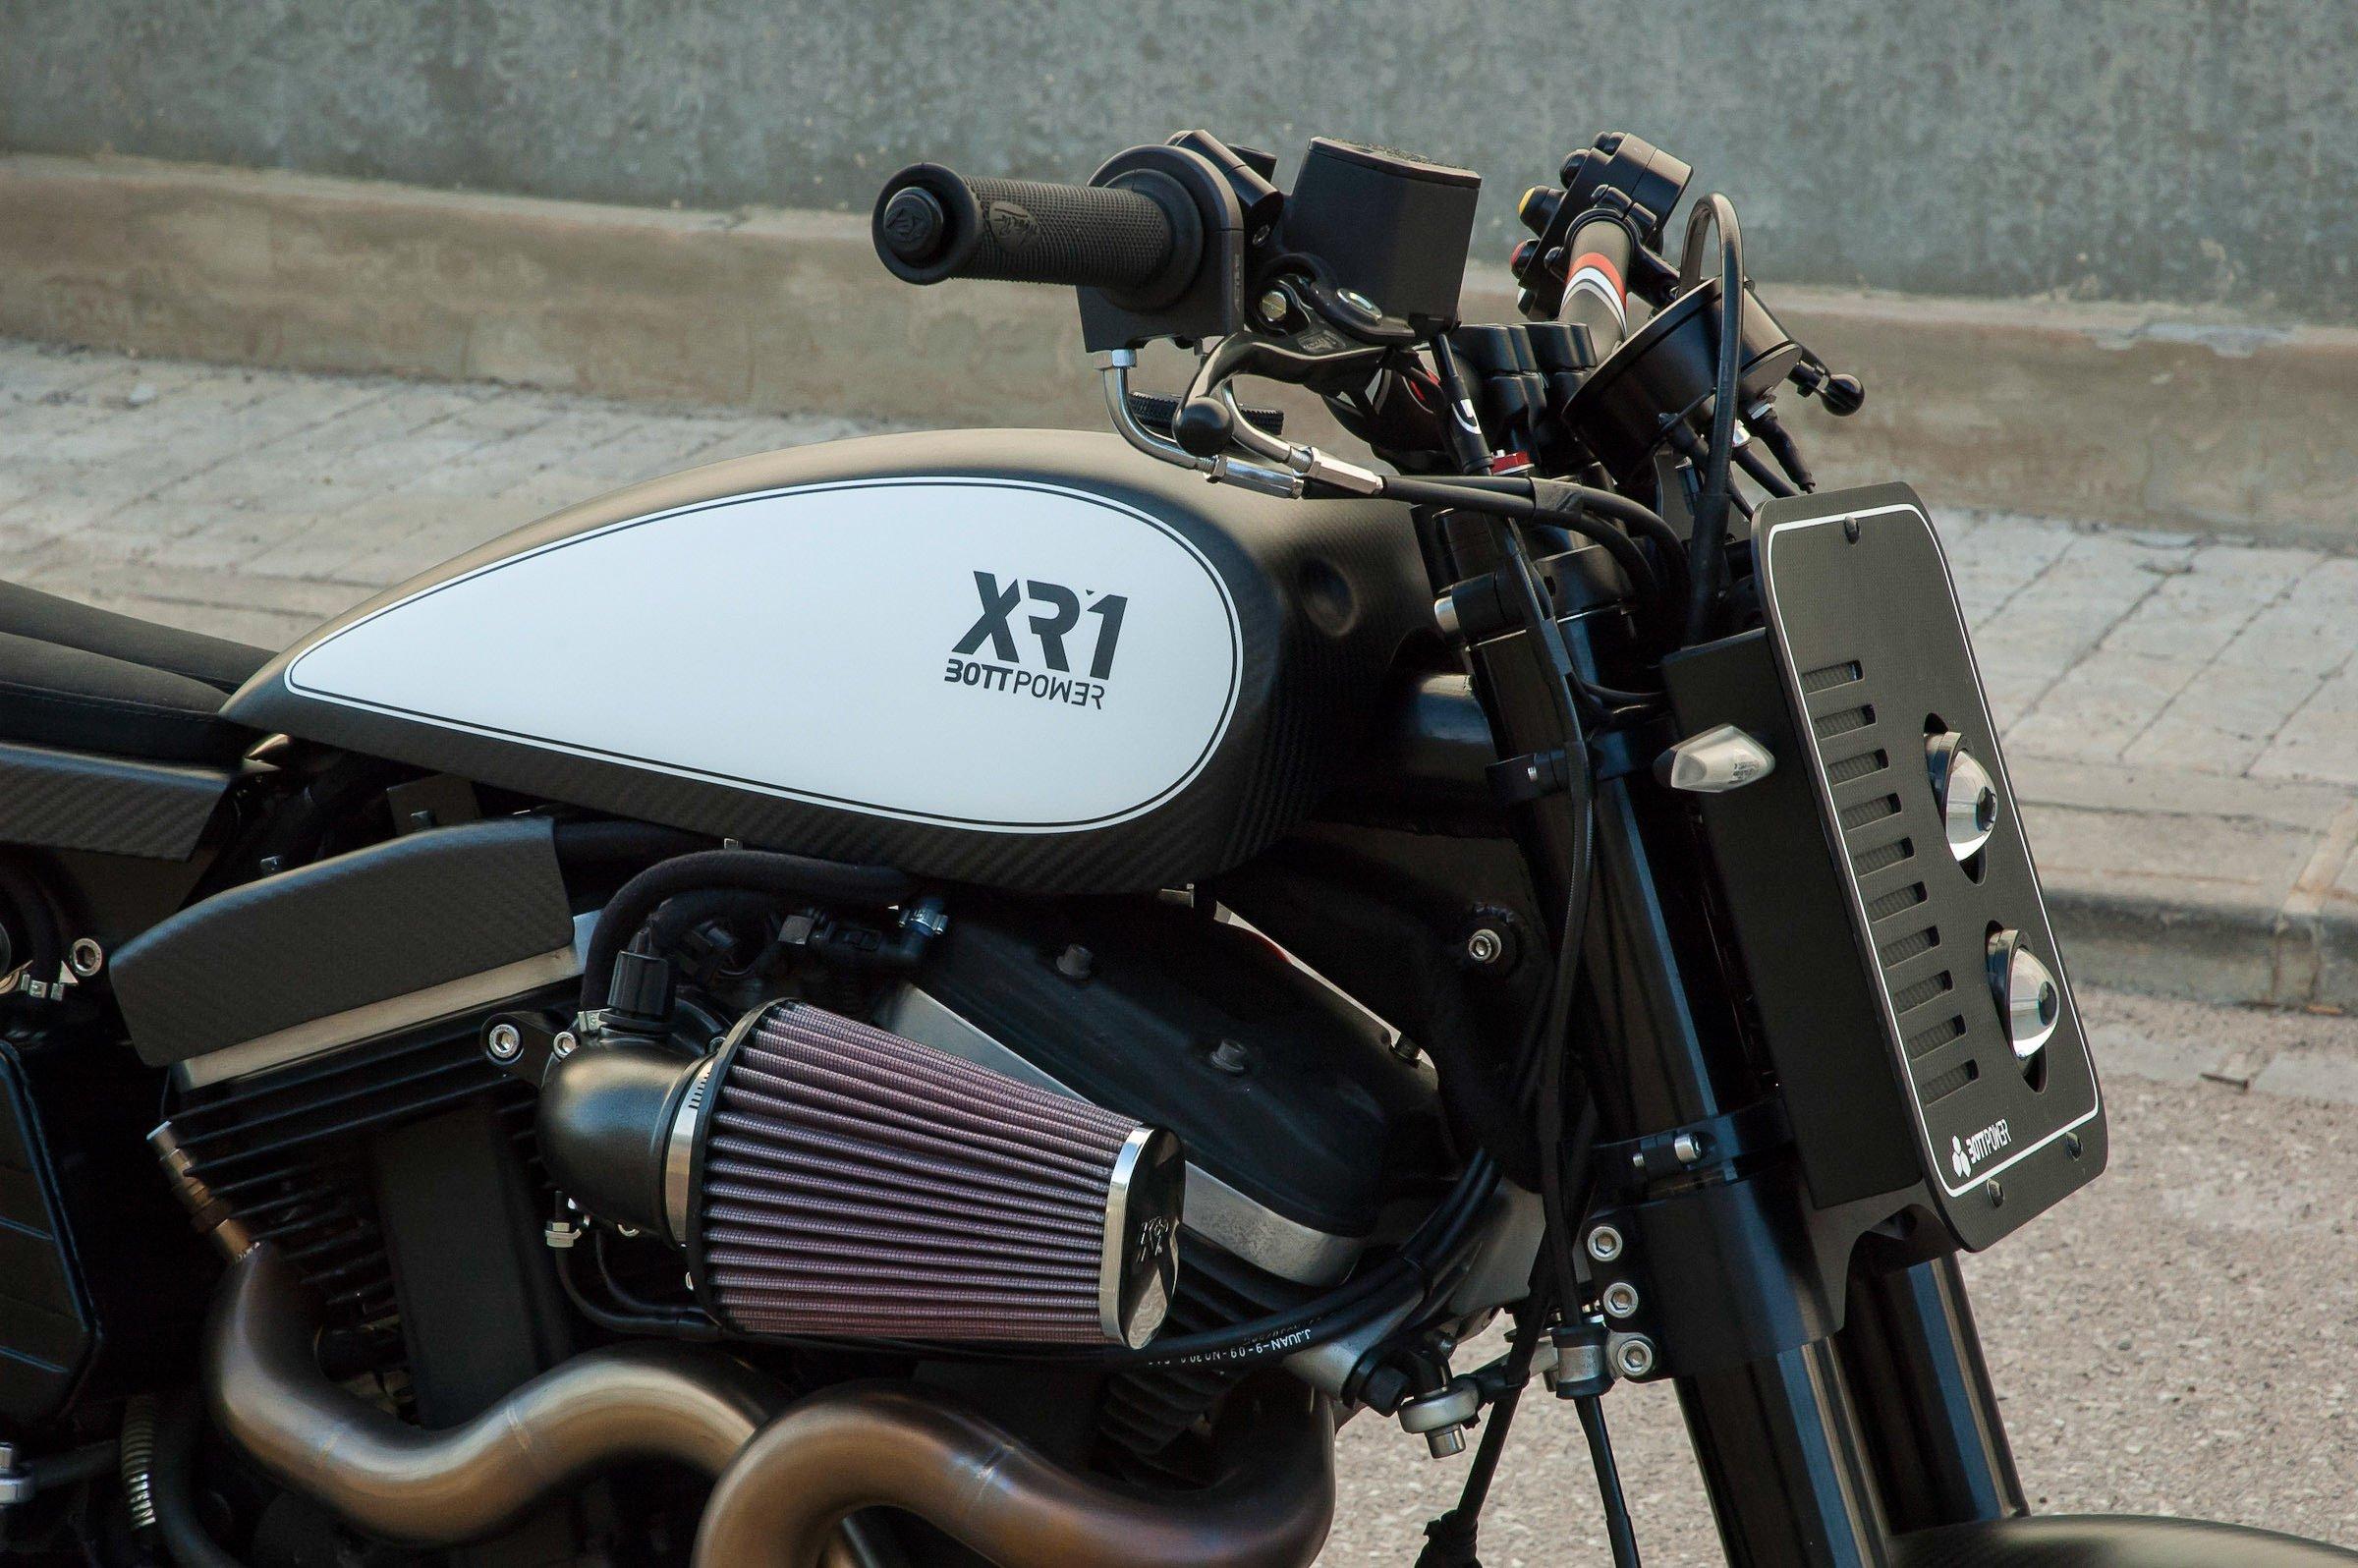 The BOTT XR1 Buell Conversion Kit